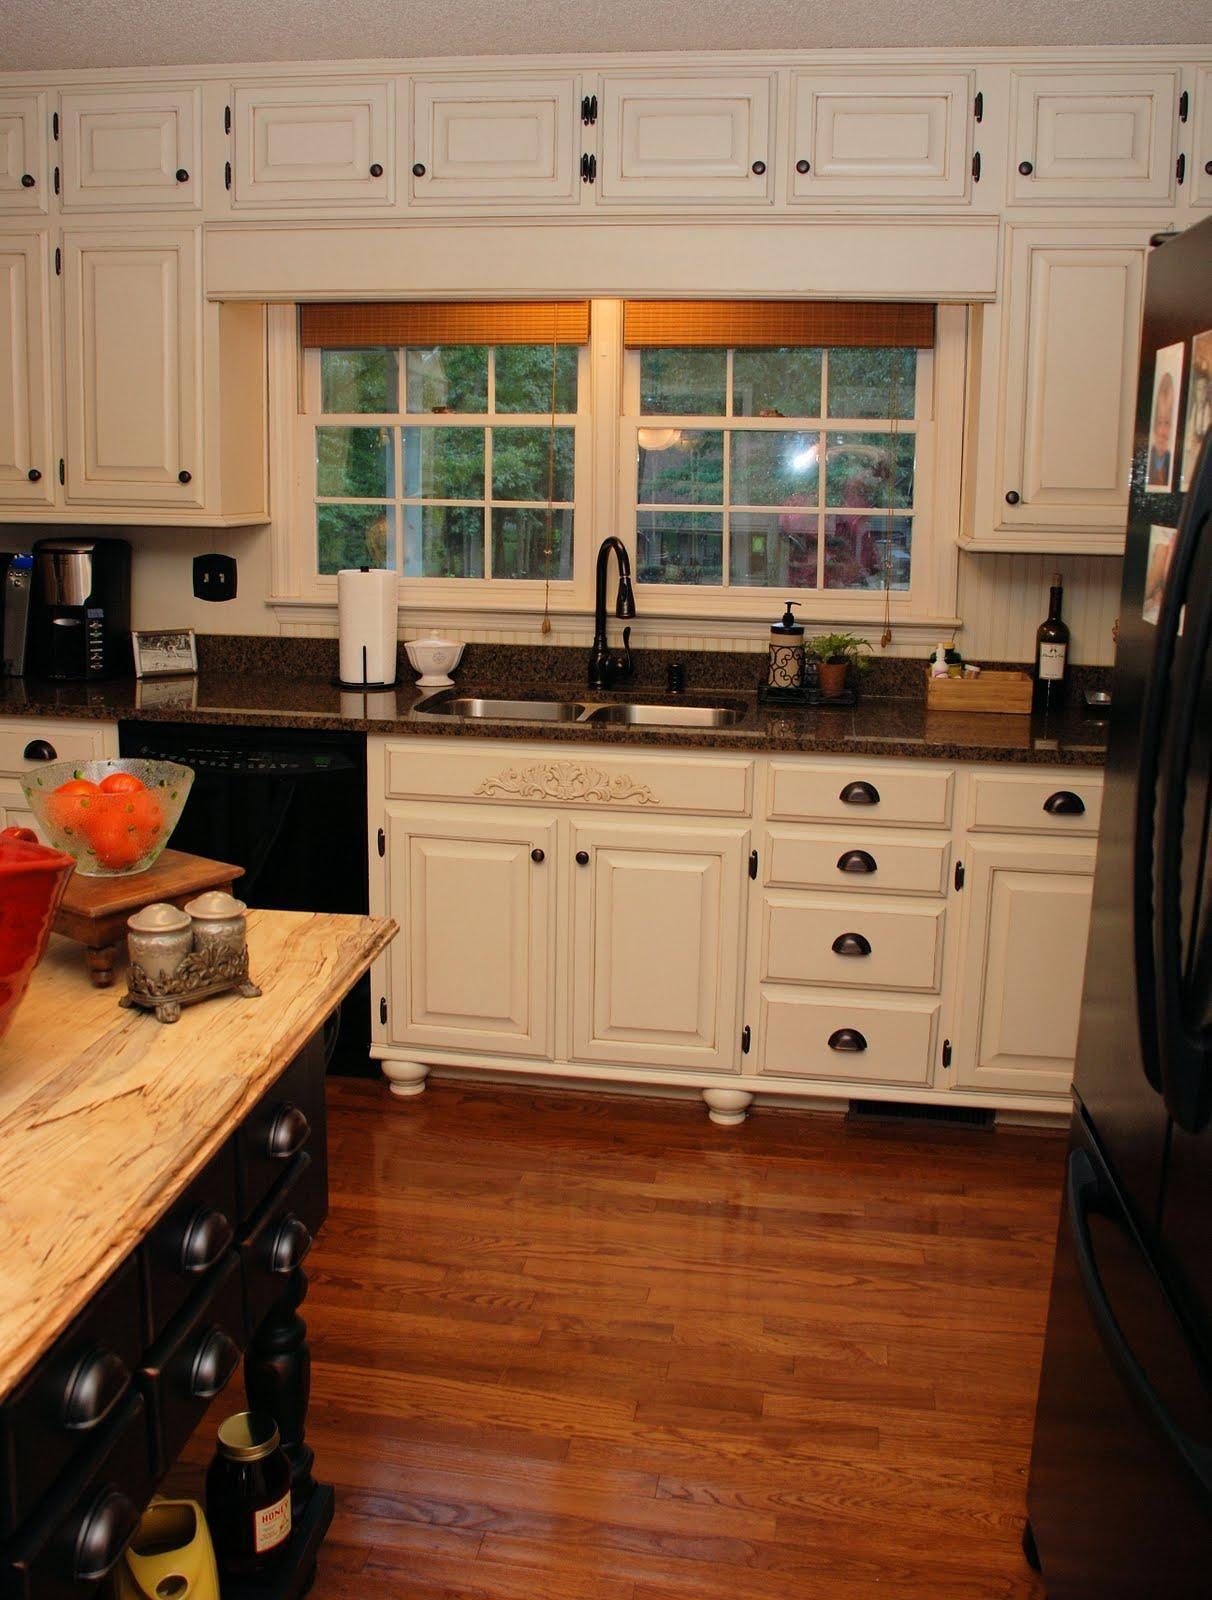 Bead board back splash | Wooden kitchen cabinets ...